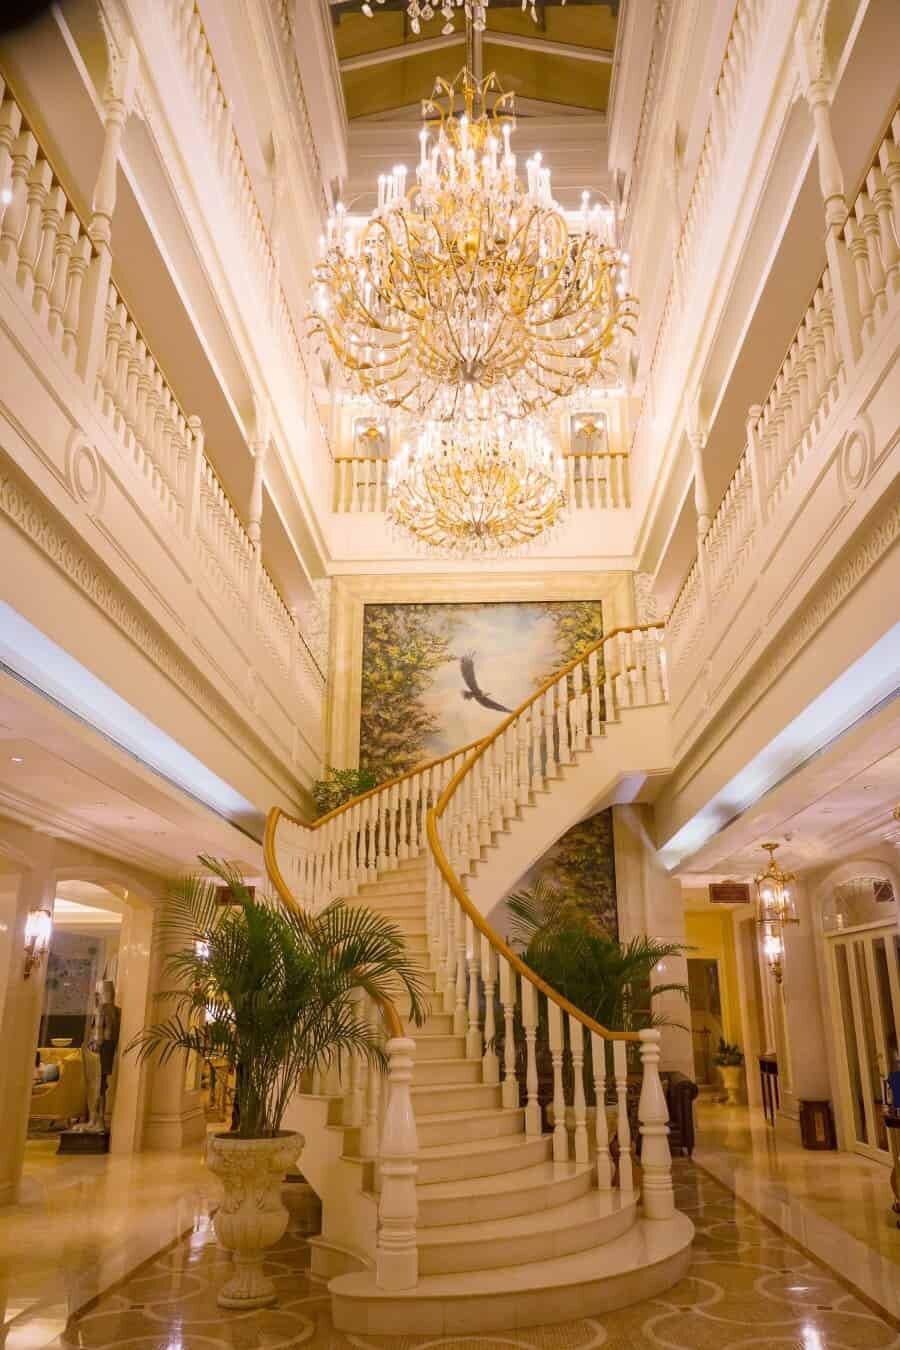 Rocks Hotel Macao - Macao photography locations